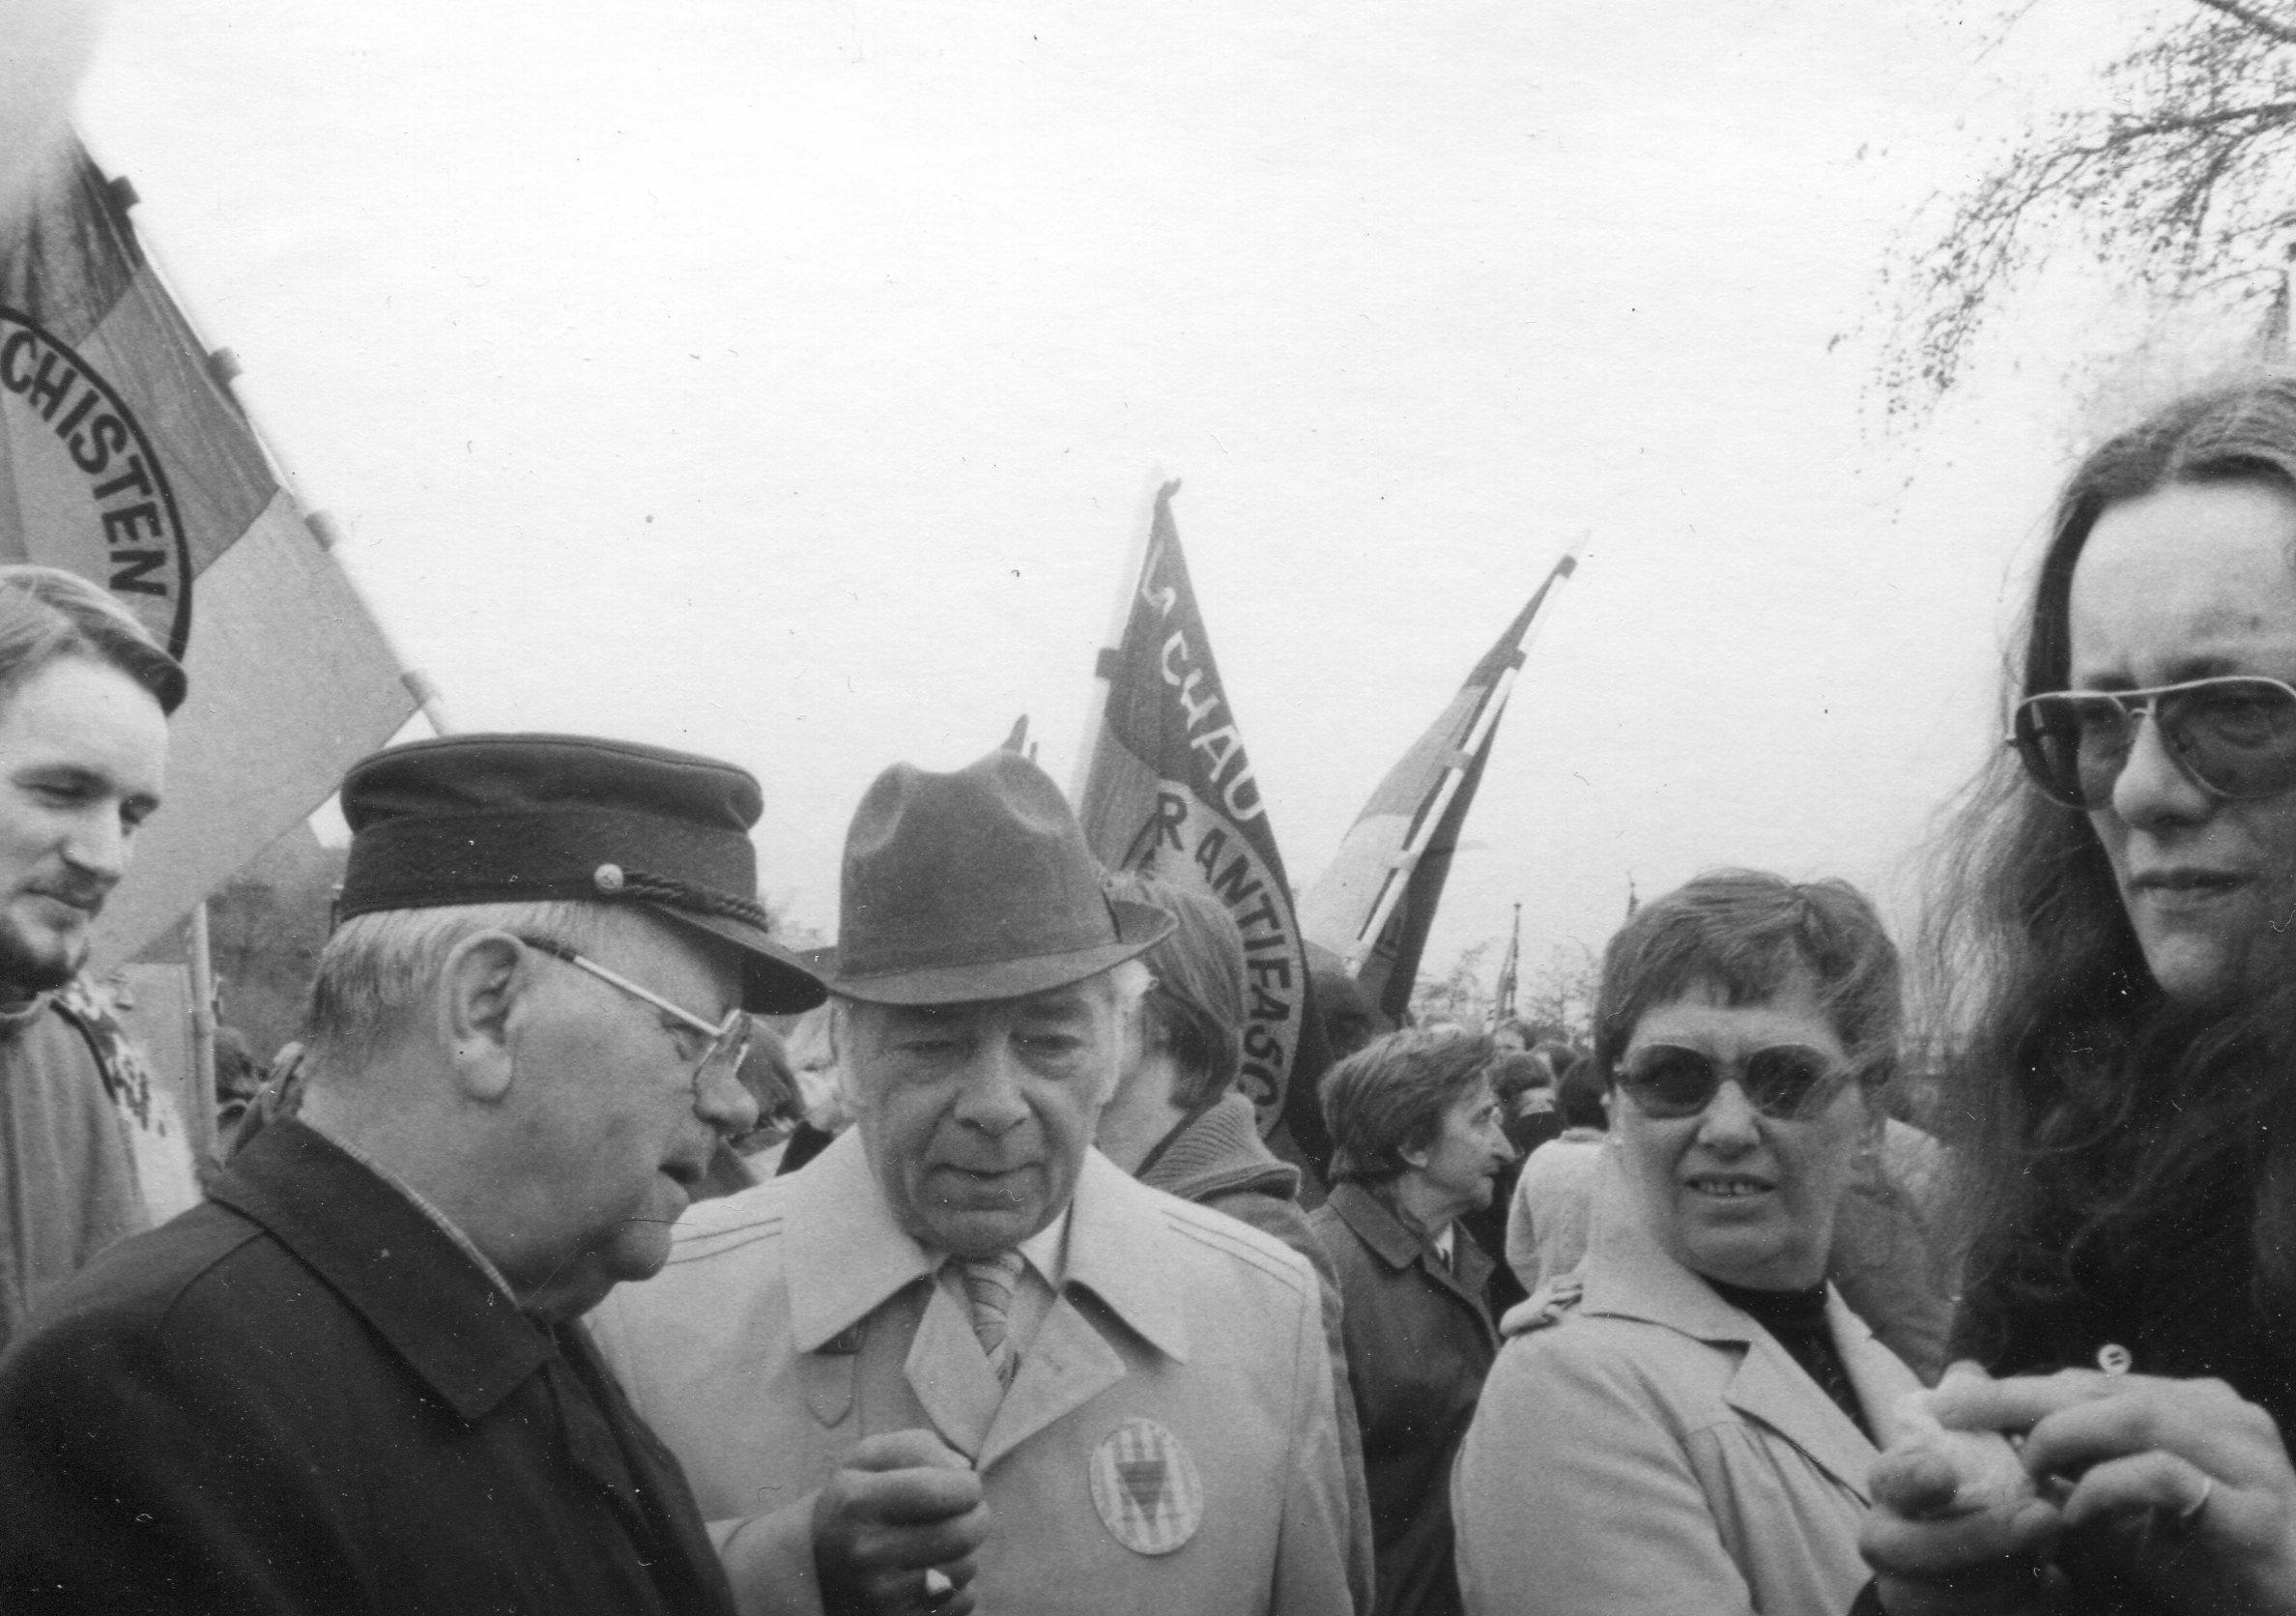 Horst Hackenbroich 21. April 1979 Strasbourg